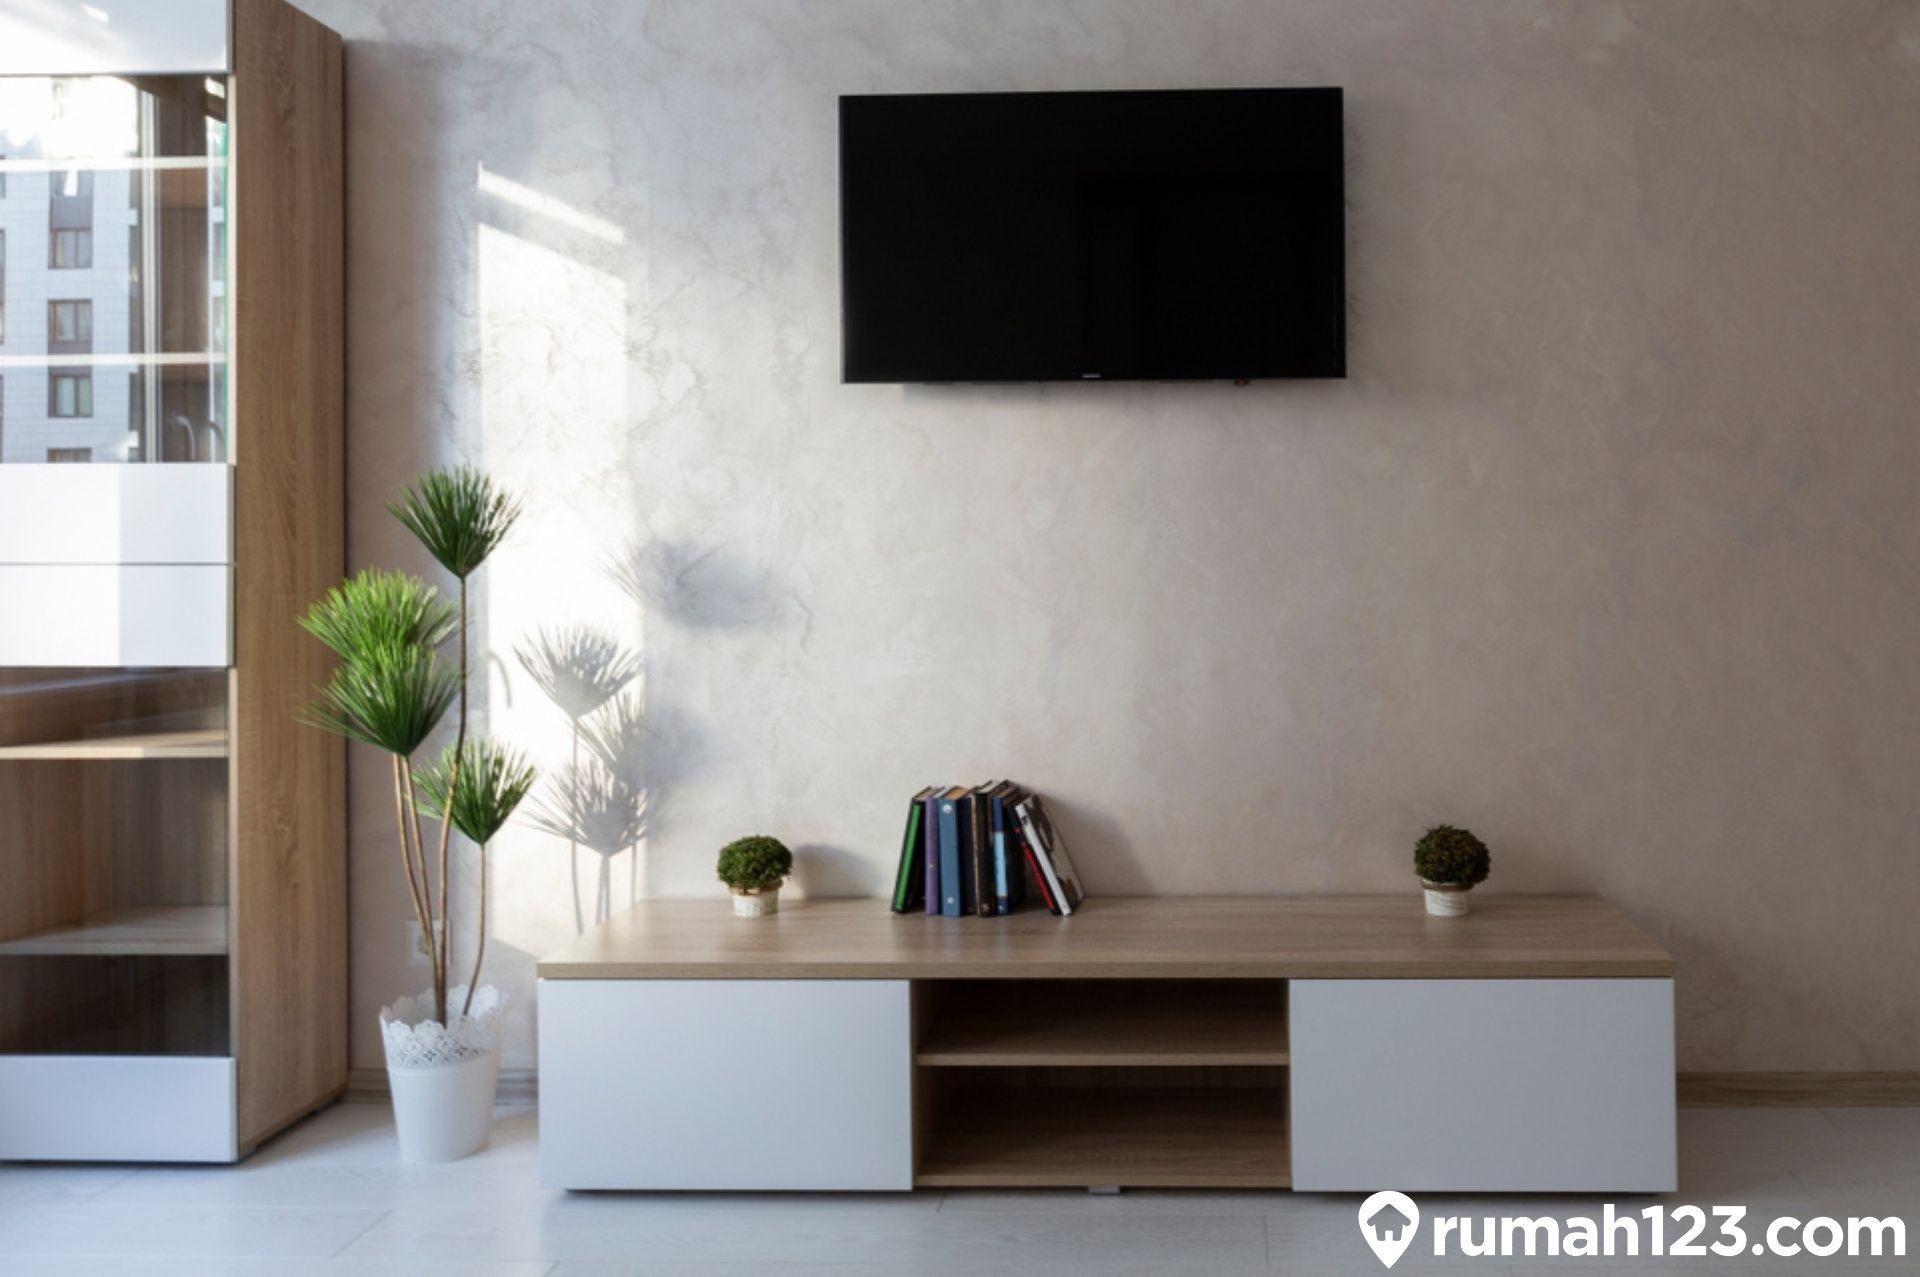 8 Rak Tv Minimalis Modern Termurah Mulai Dari Rp200 Ribuan Rumah123 Com